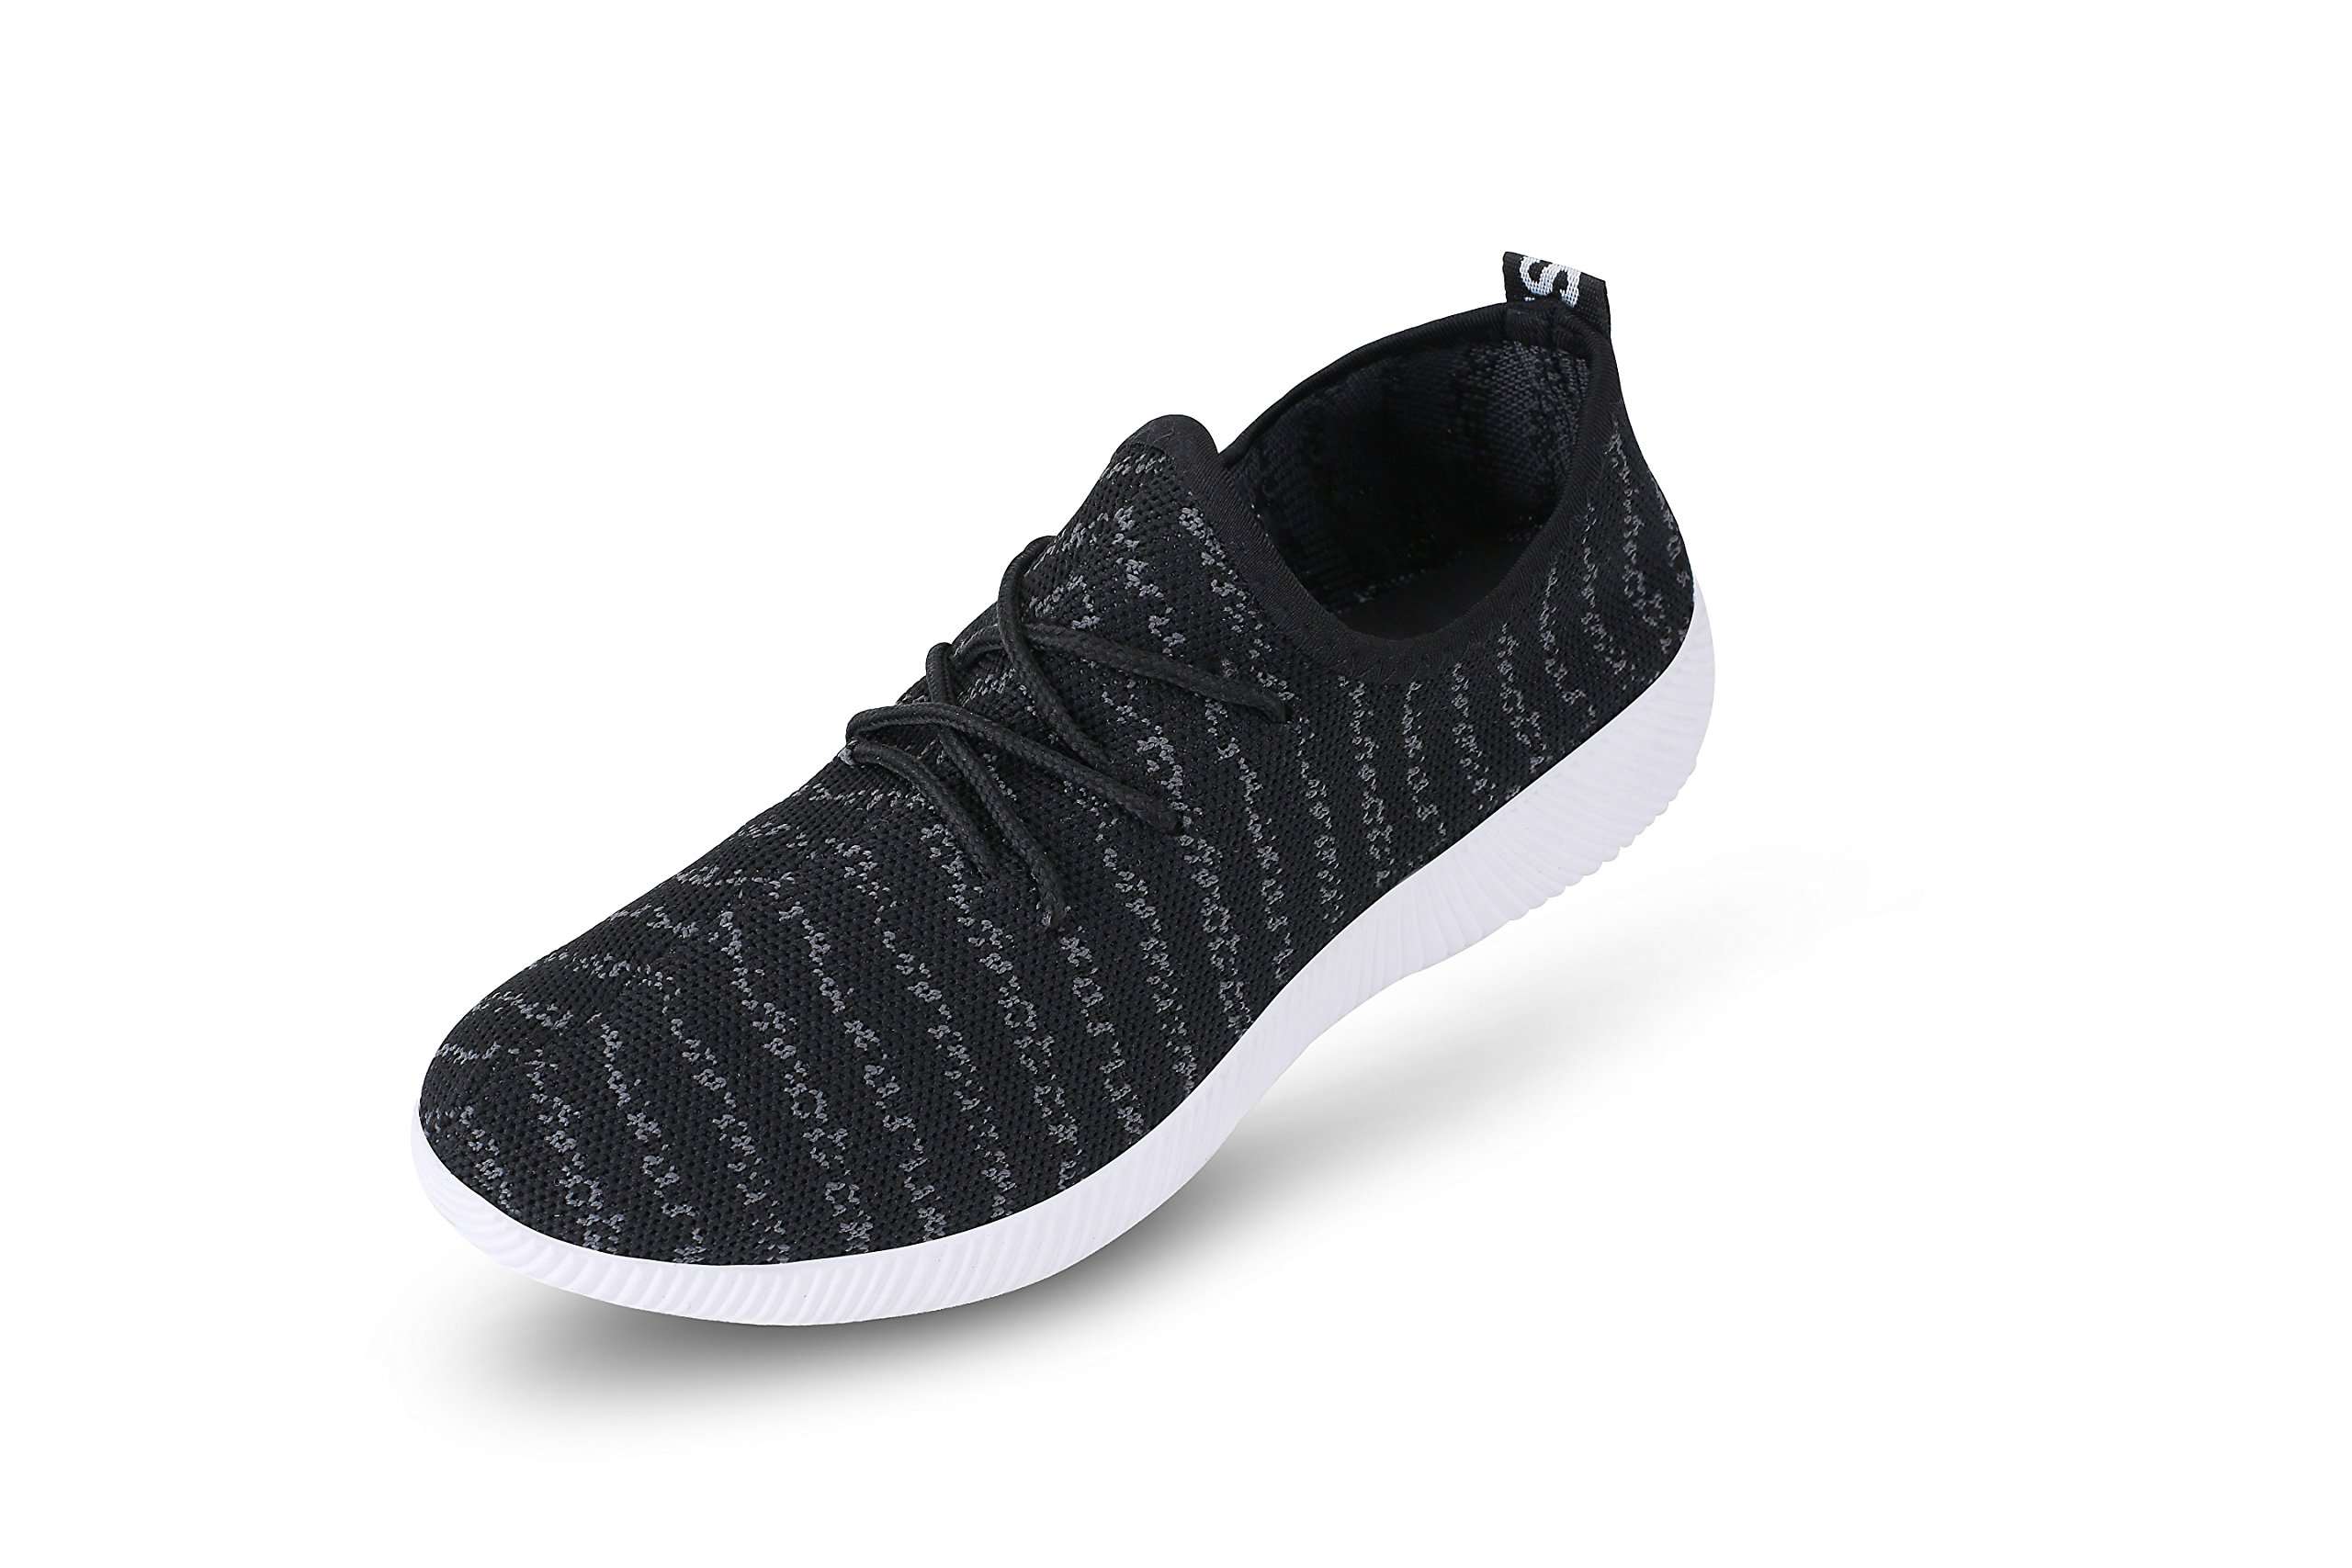 RainingWooD Women's Fashion Sneakers Running Shoes Casual Sport Shoes (8, Black)